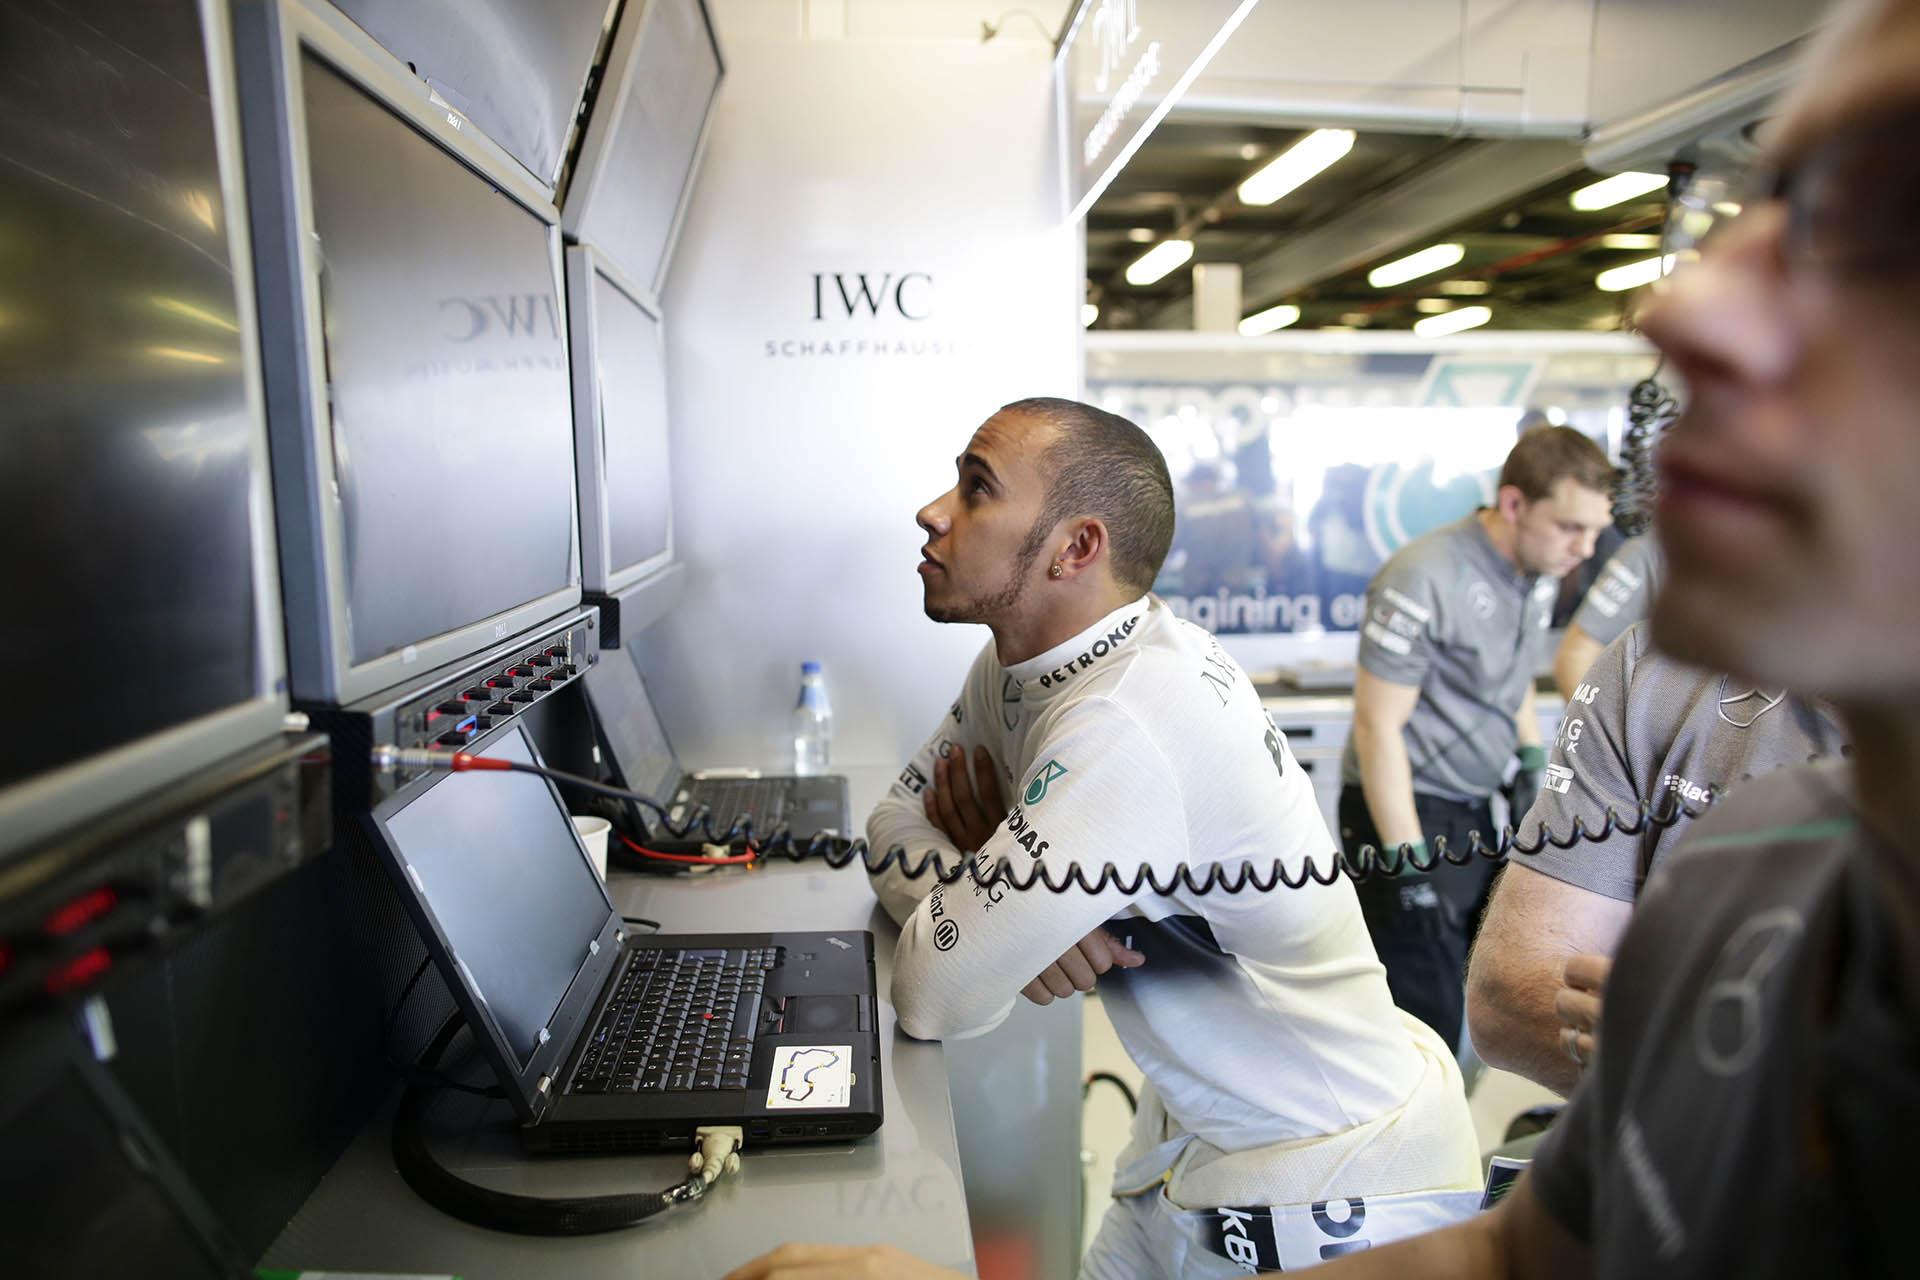 IWC-Testimonial Lewis Hamilton in der Mercedes-Box